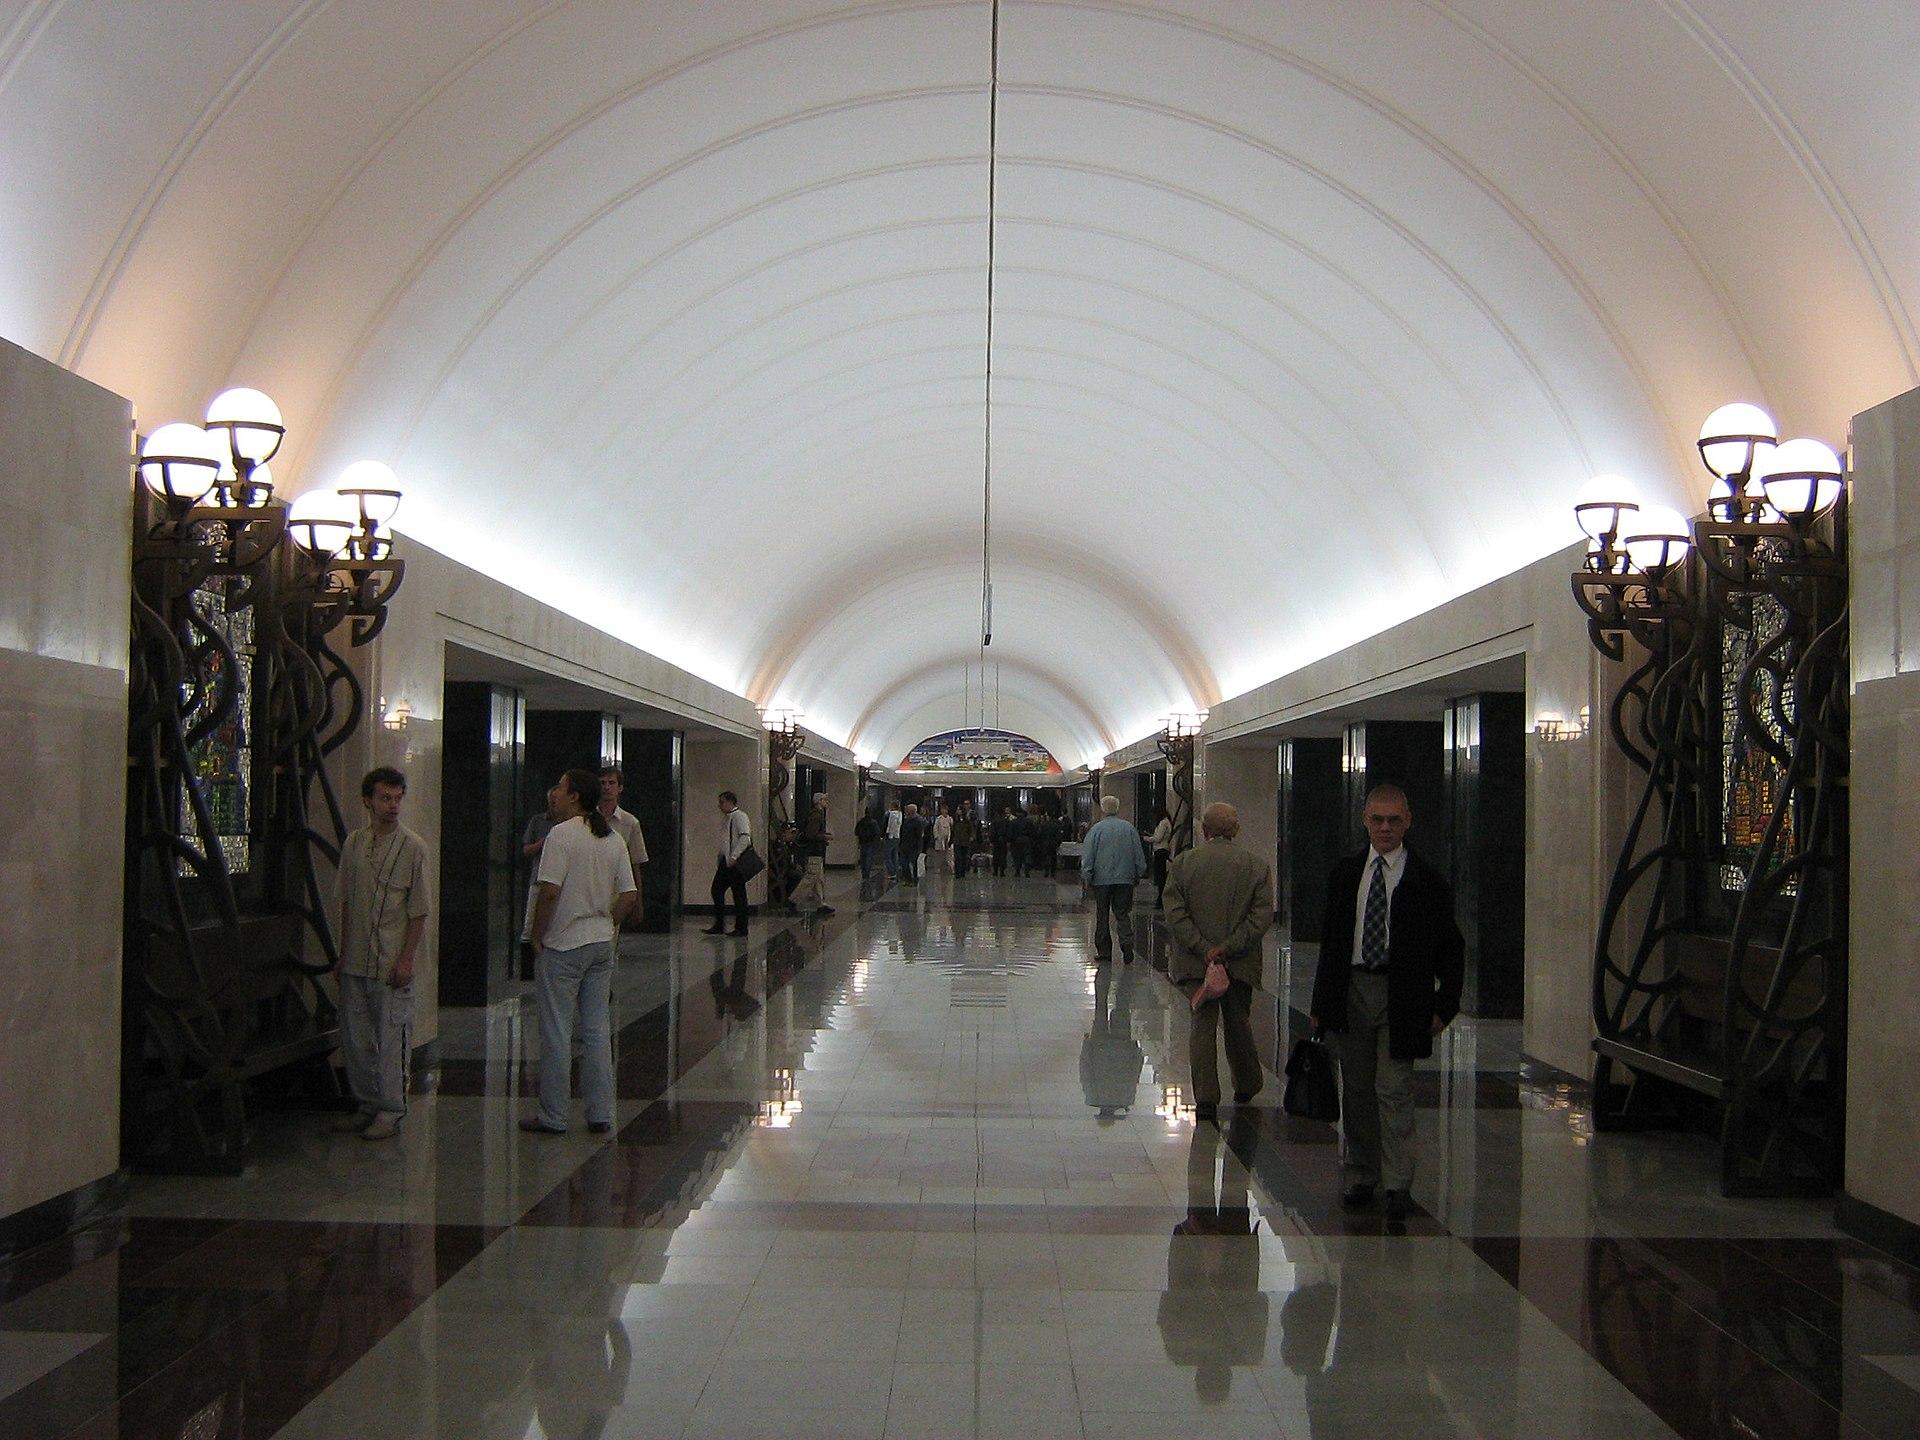 Trubnaya Moscow Metro Wikipedia